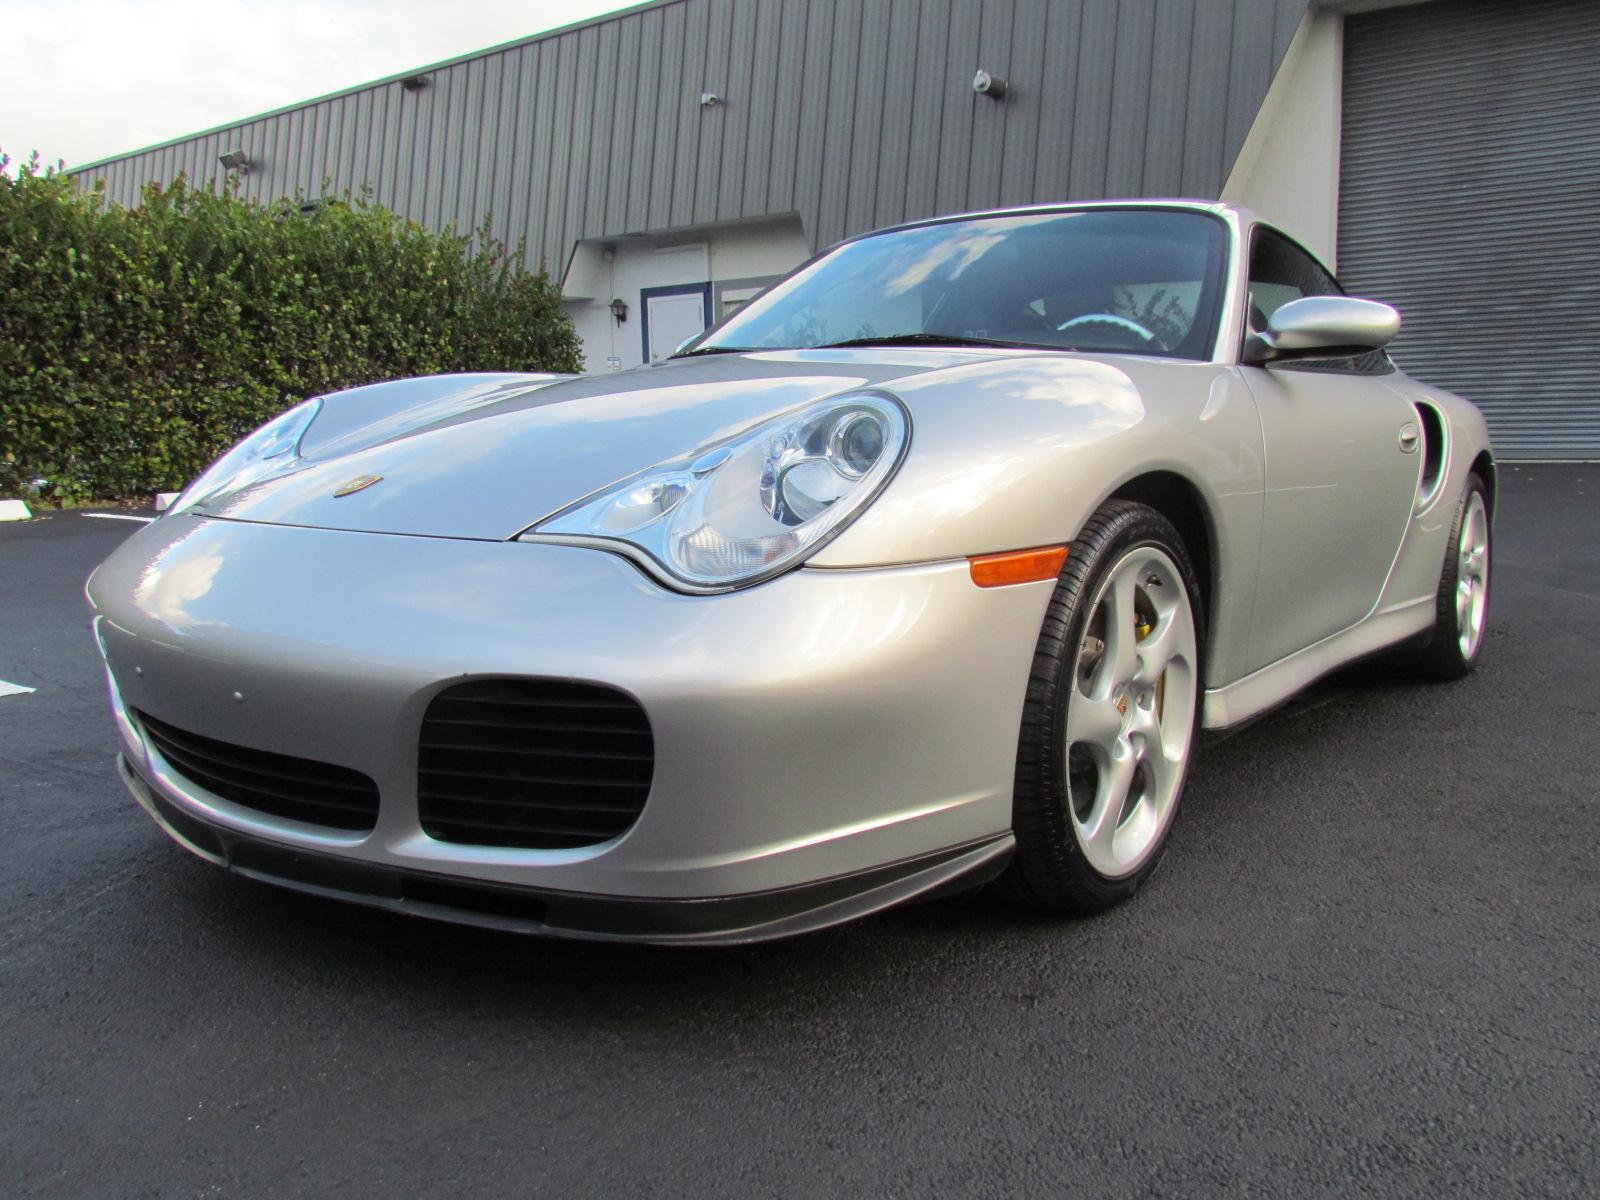 2005 Porsche Turbo S Coupe